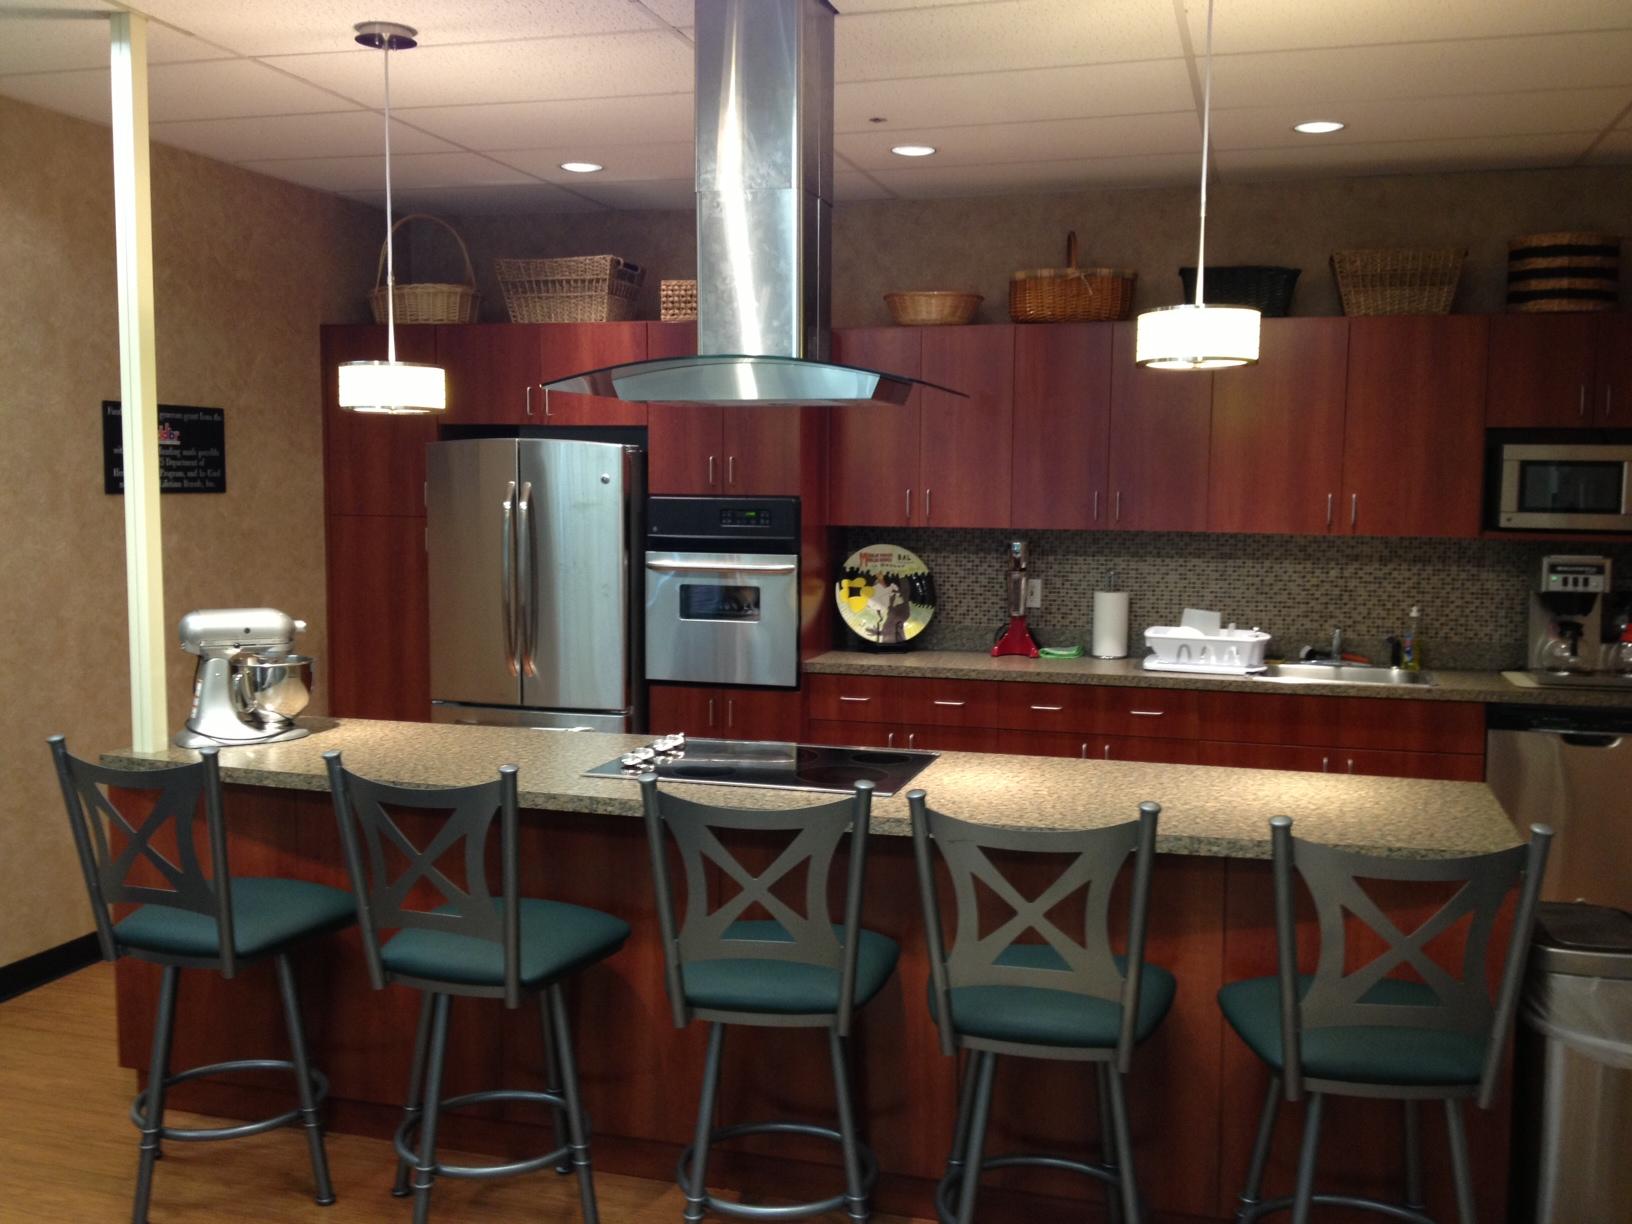 long kitchen island custom hoods cares cuts ribbon on new ddbr studio